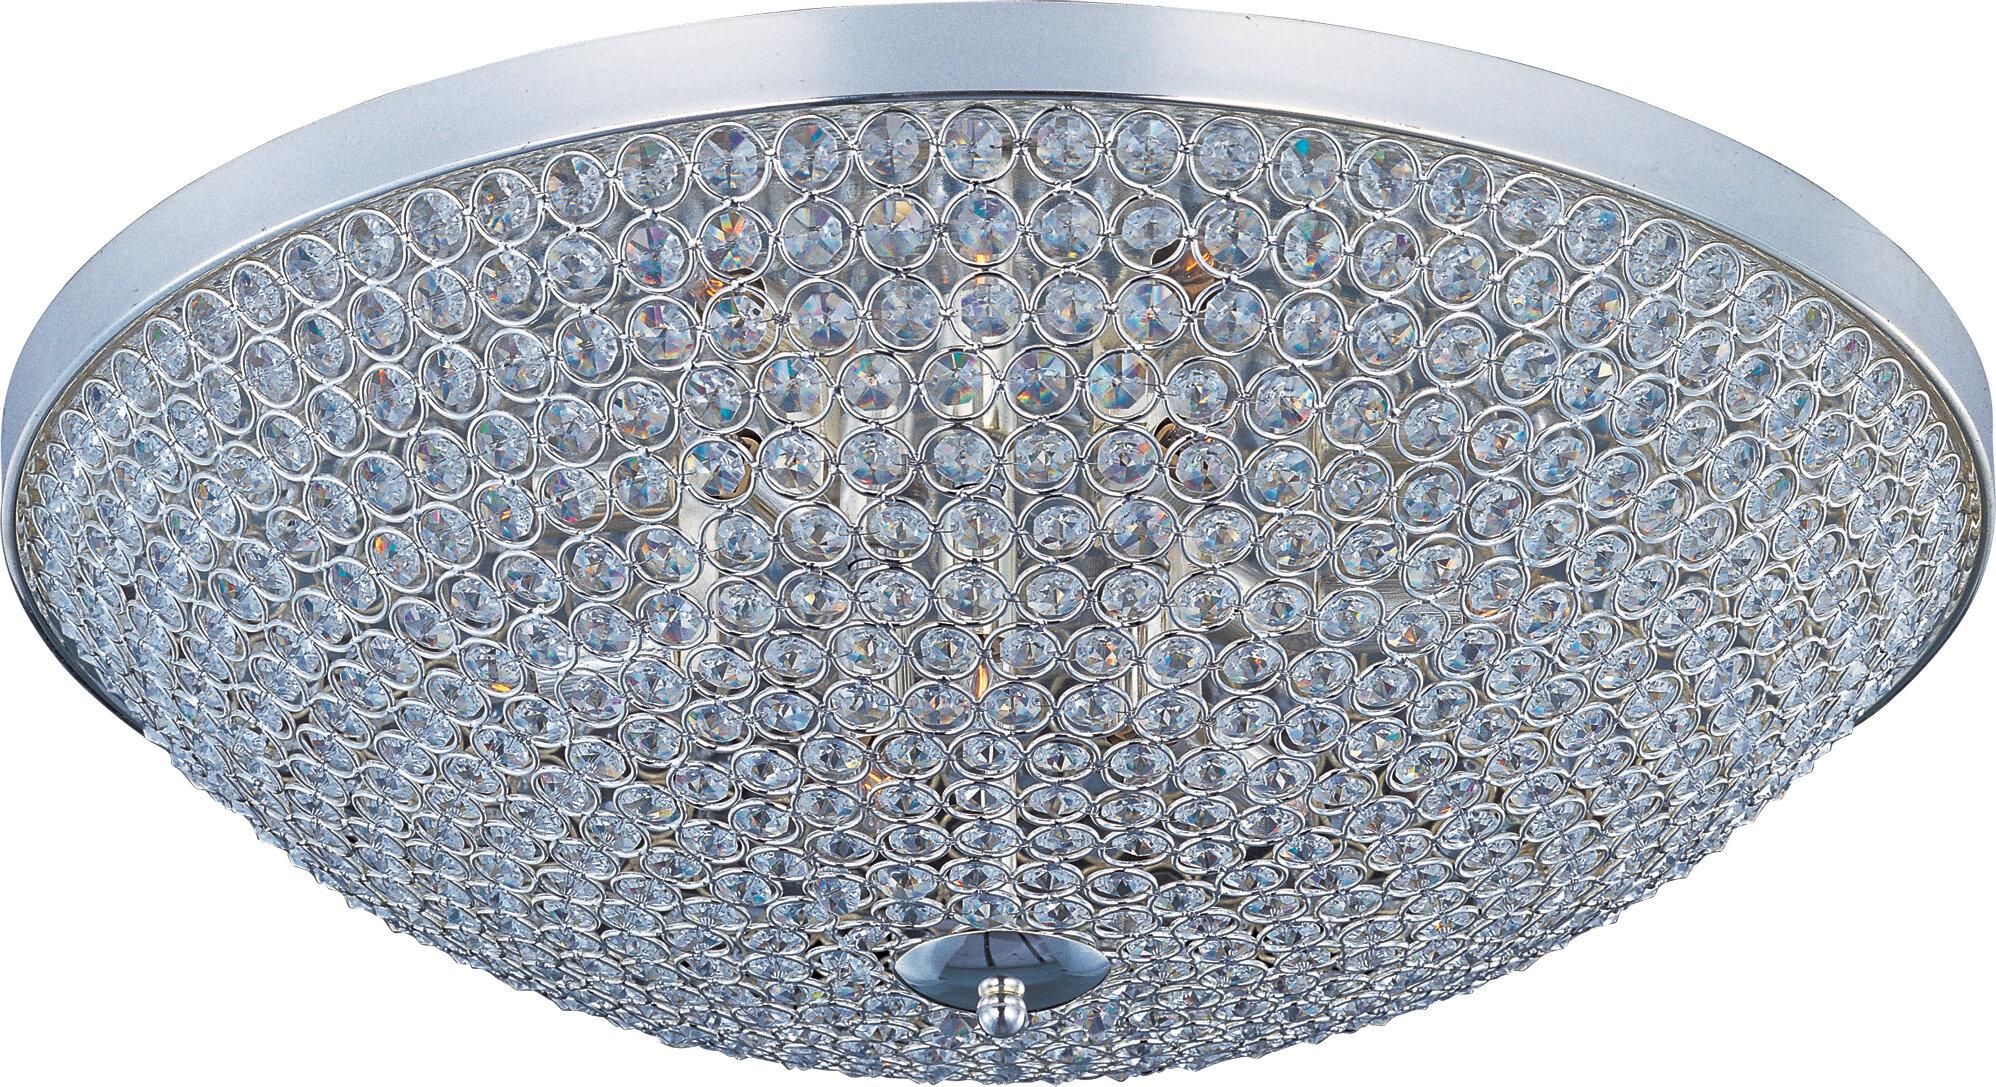 Willa Arlo Interiors Krueger 6 Light 19 Cluster Bowl Flush Mount Reviews Wayfair